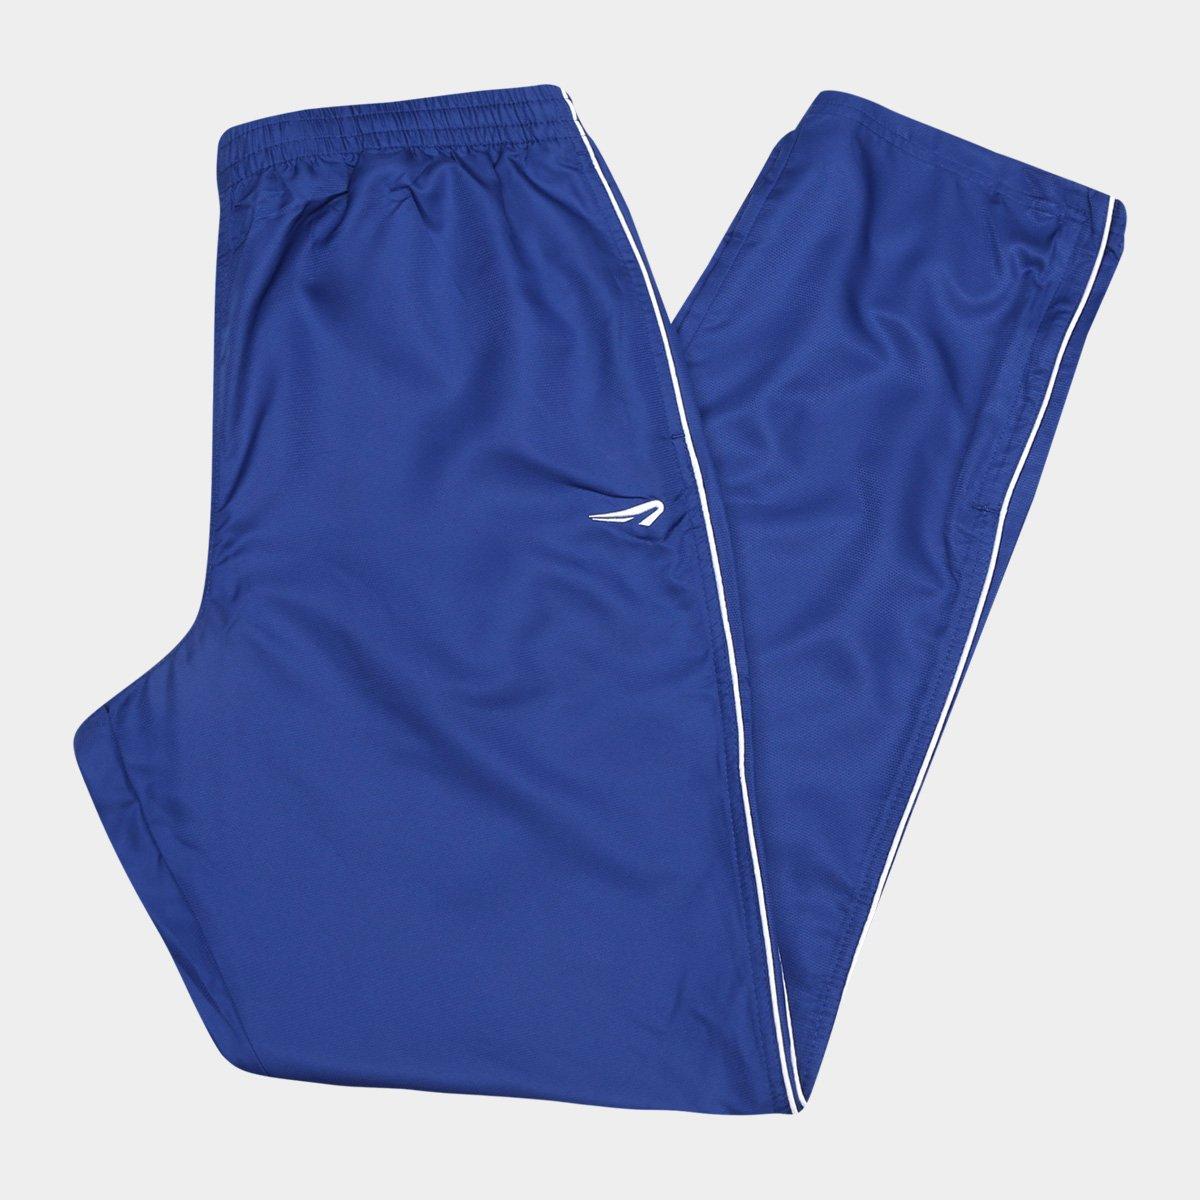 Calça Rainha Standard Masculina - Azul